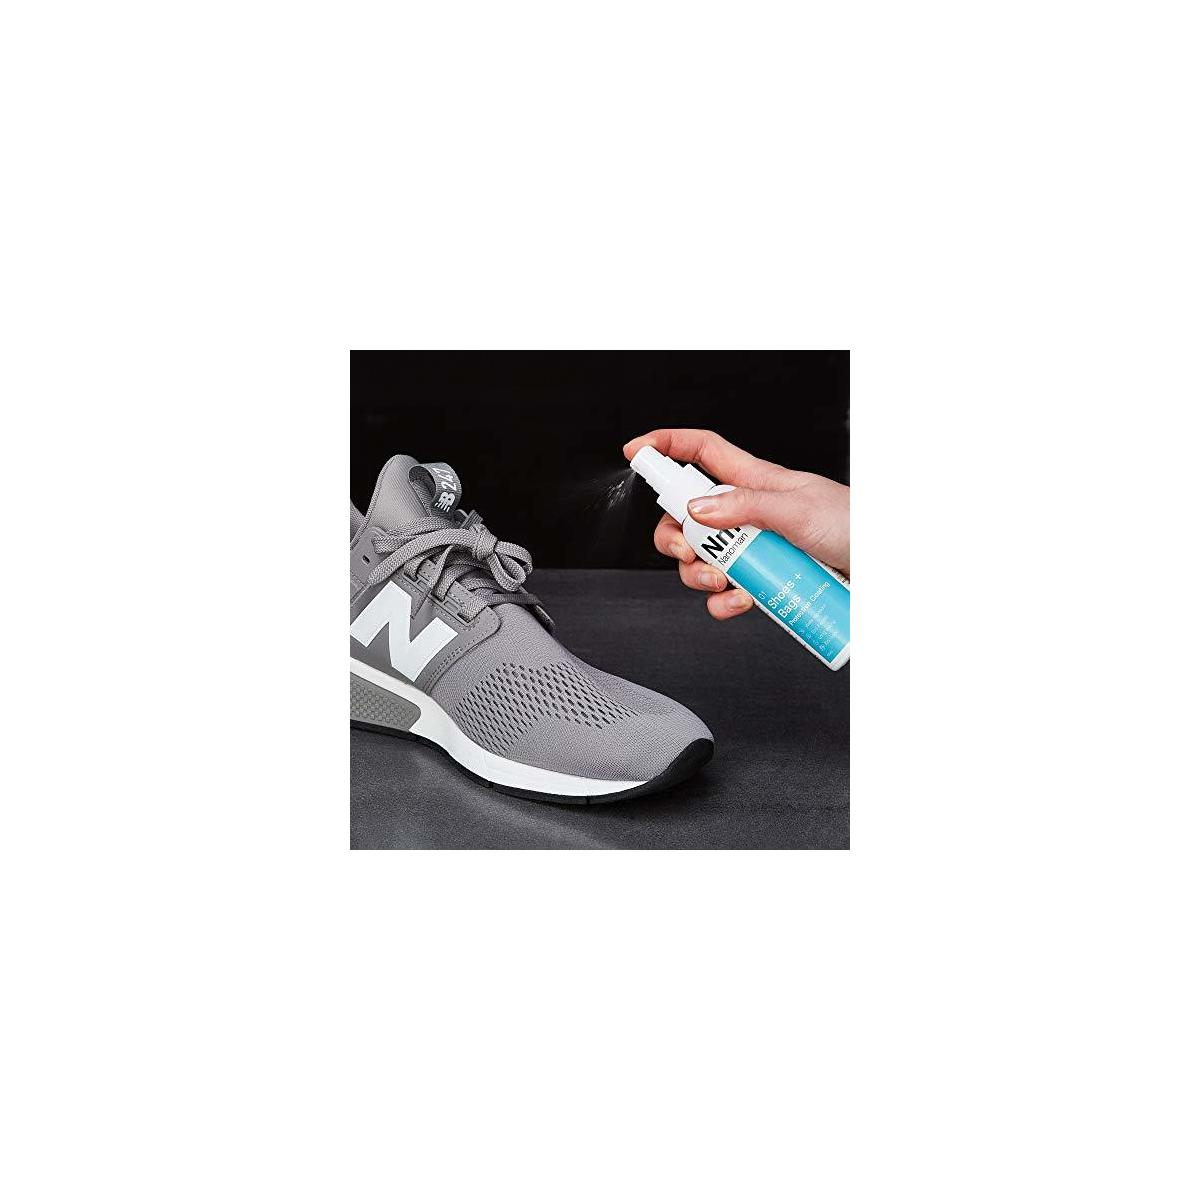 Nanoman Shoe Protector Spray